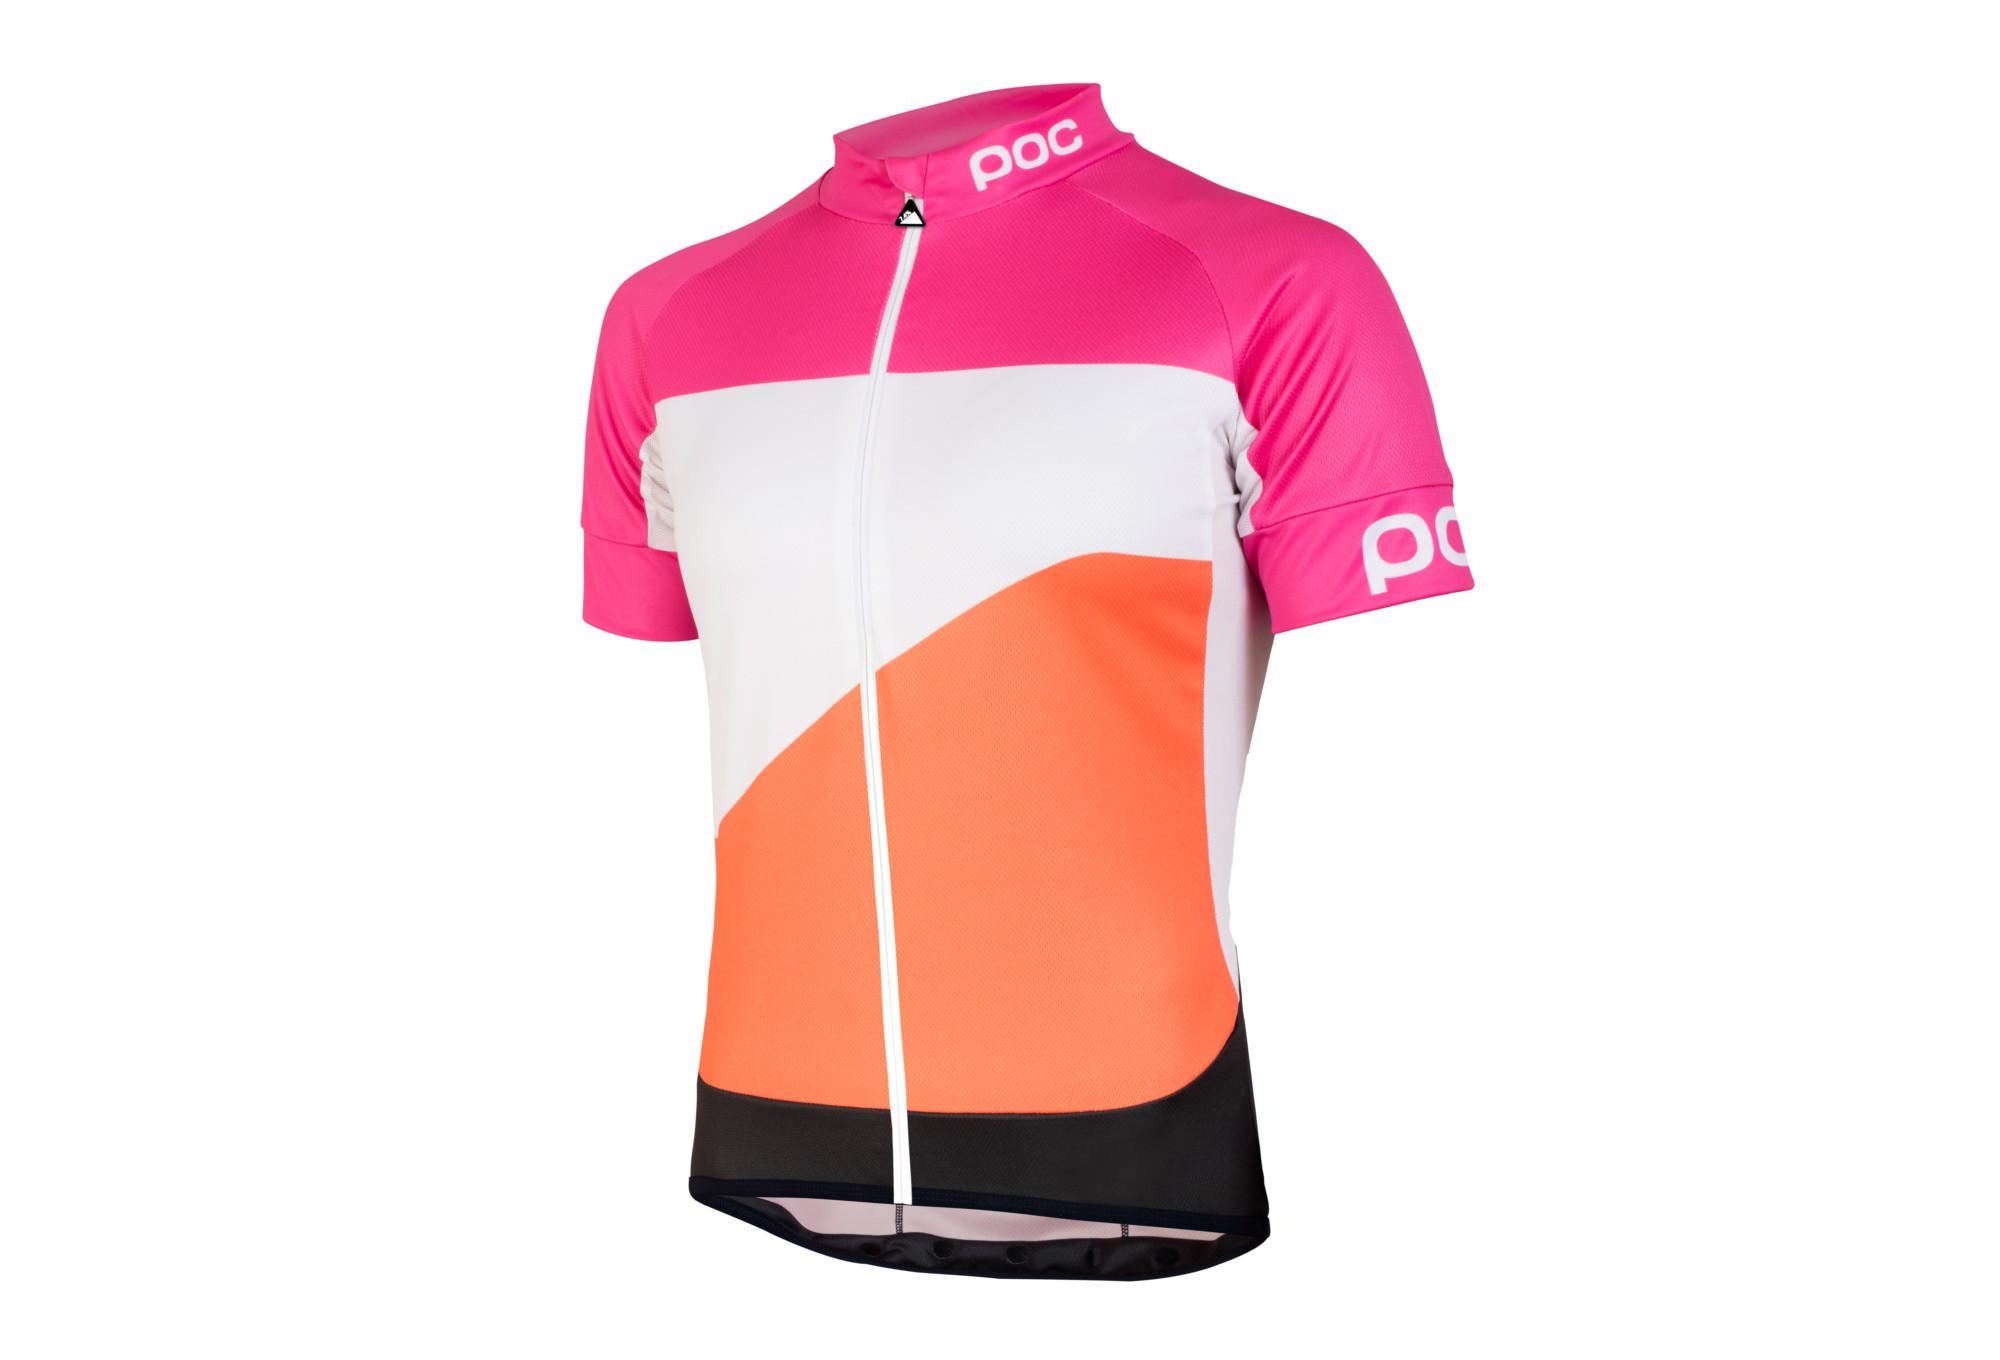 Kurze Ärmel Jersey POC 2017 Fondo Gradient Pink Orange  31768b12a